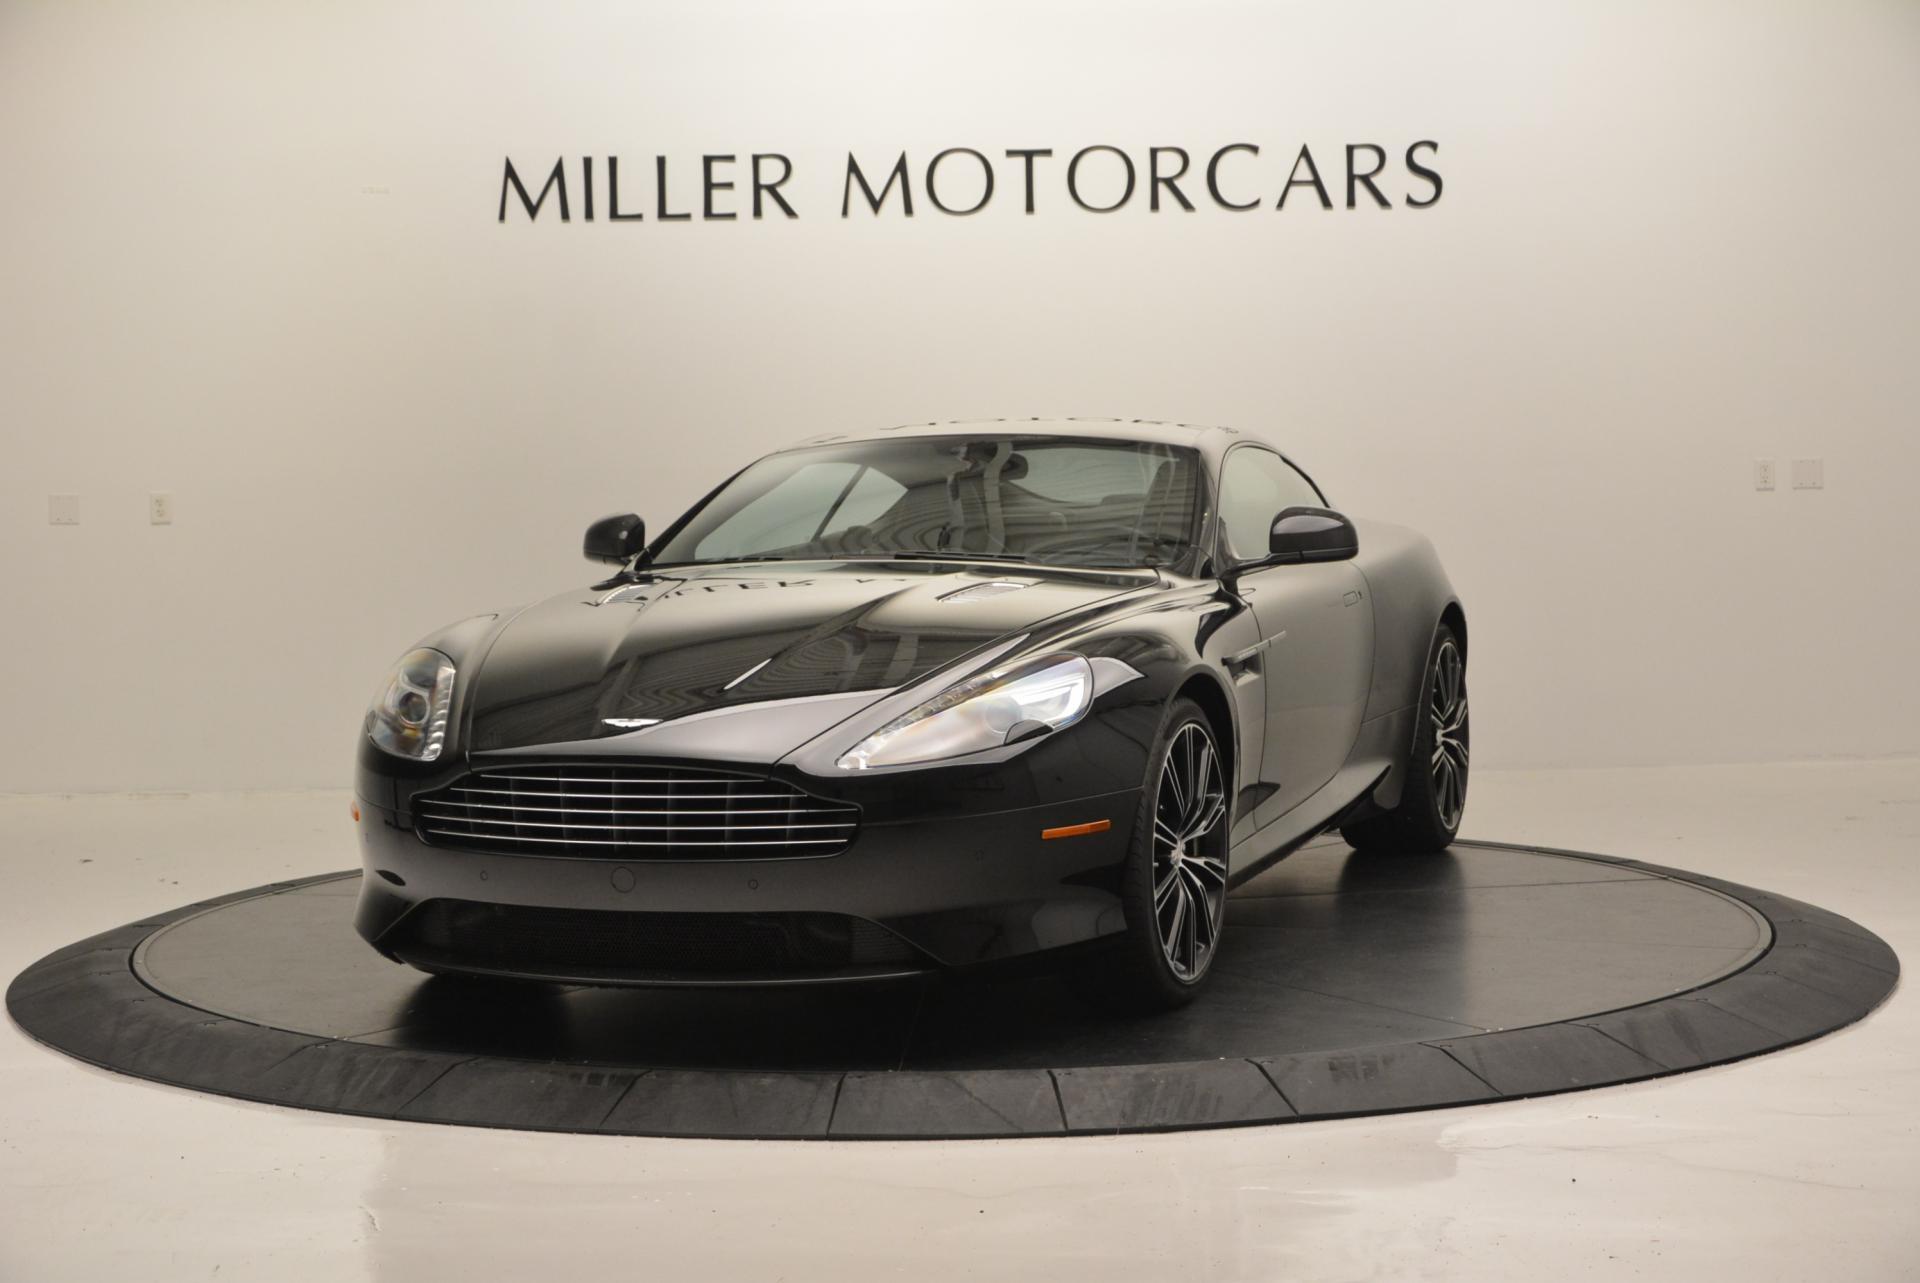 Used 2015 Aston Martin DB9 Carbon Edition For Sale In Greenwich, CT. Alfa Romeo of Greenwich, 7349 528_main